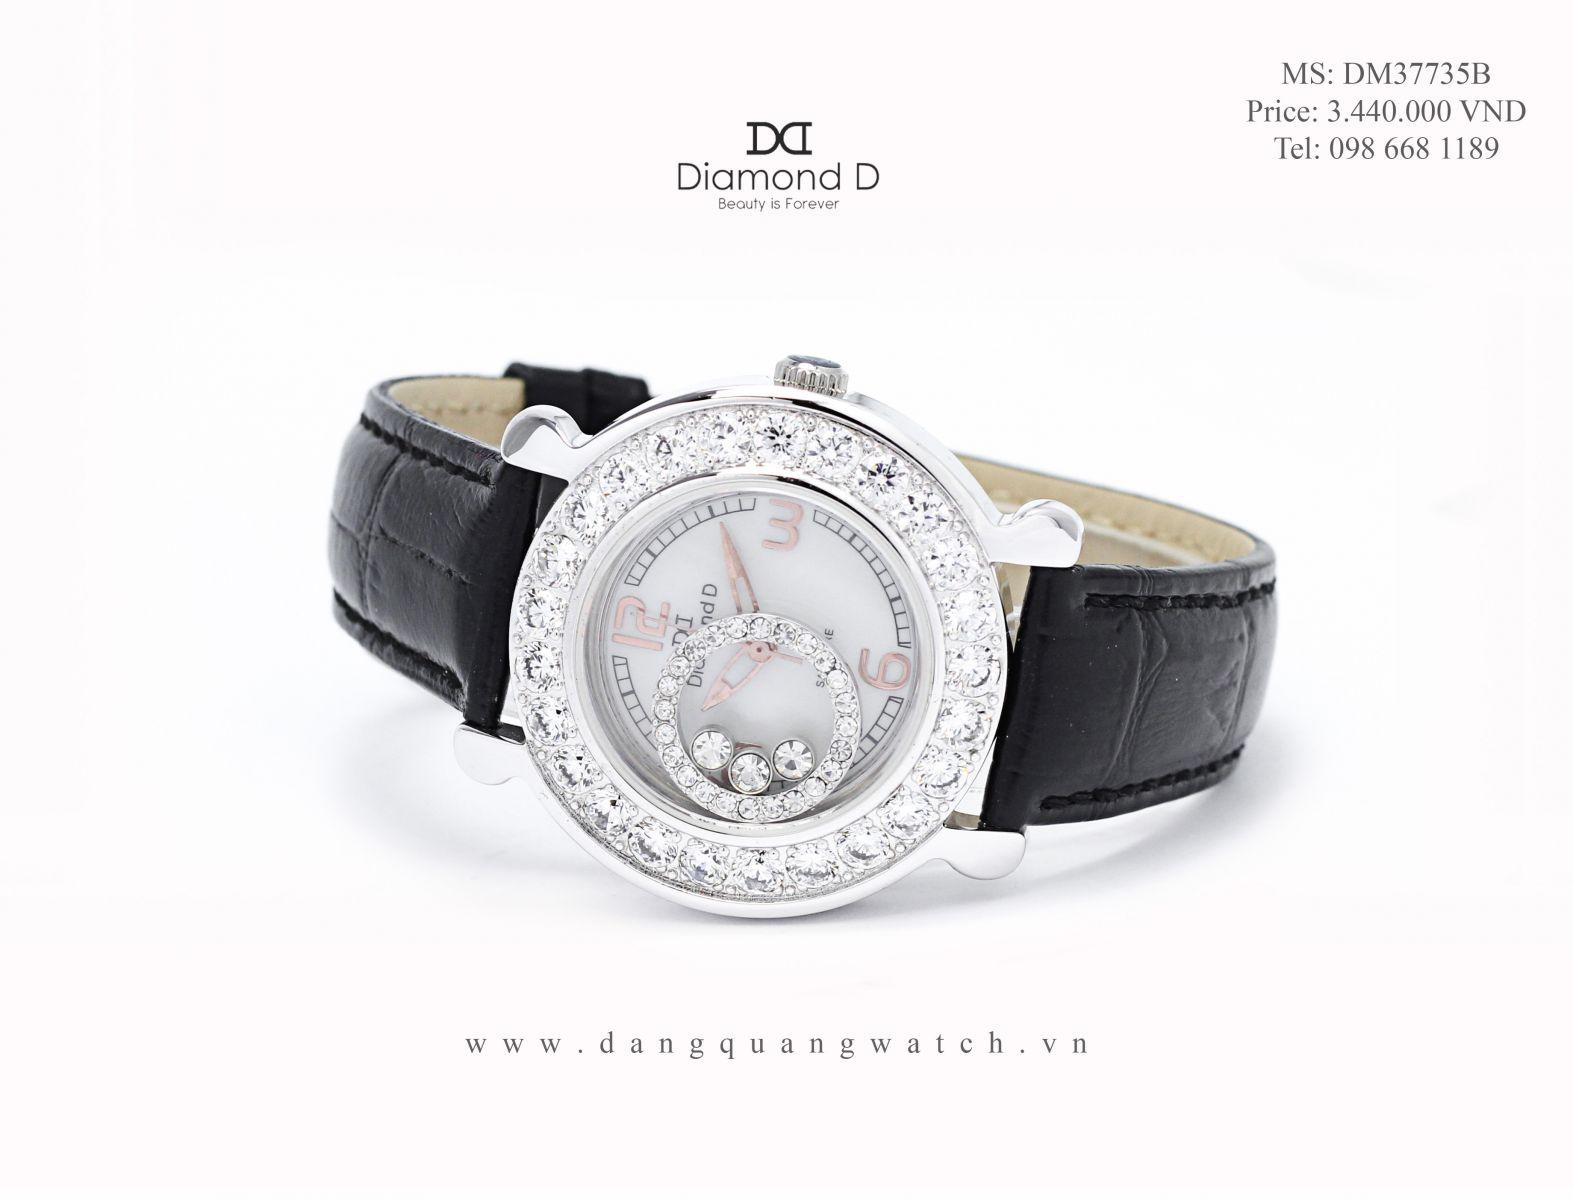 đồng hồ diamond d DM37735B